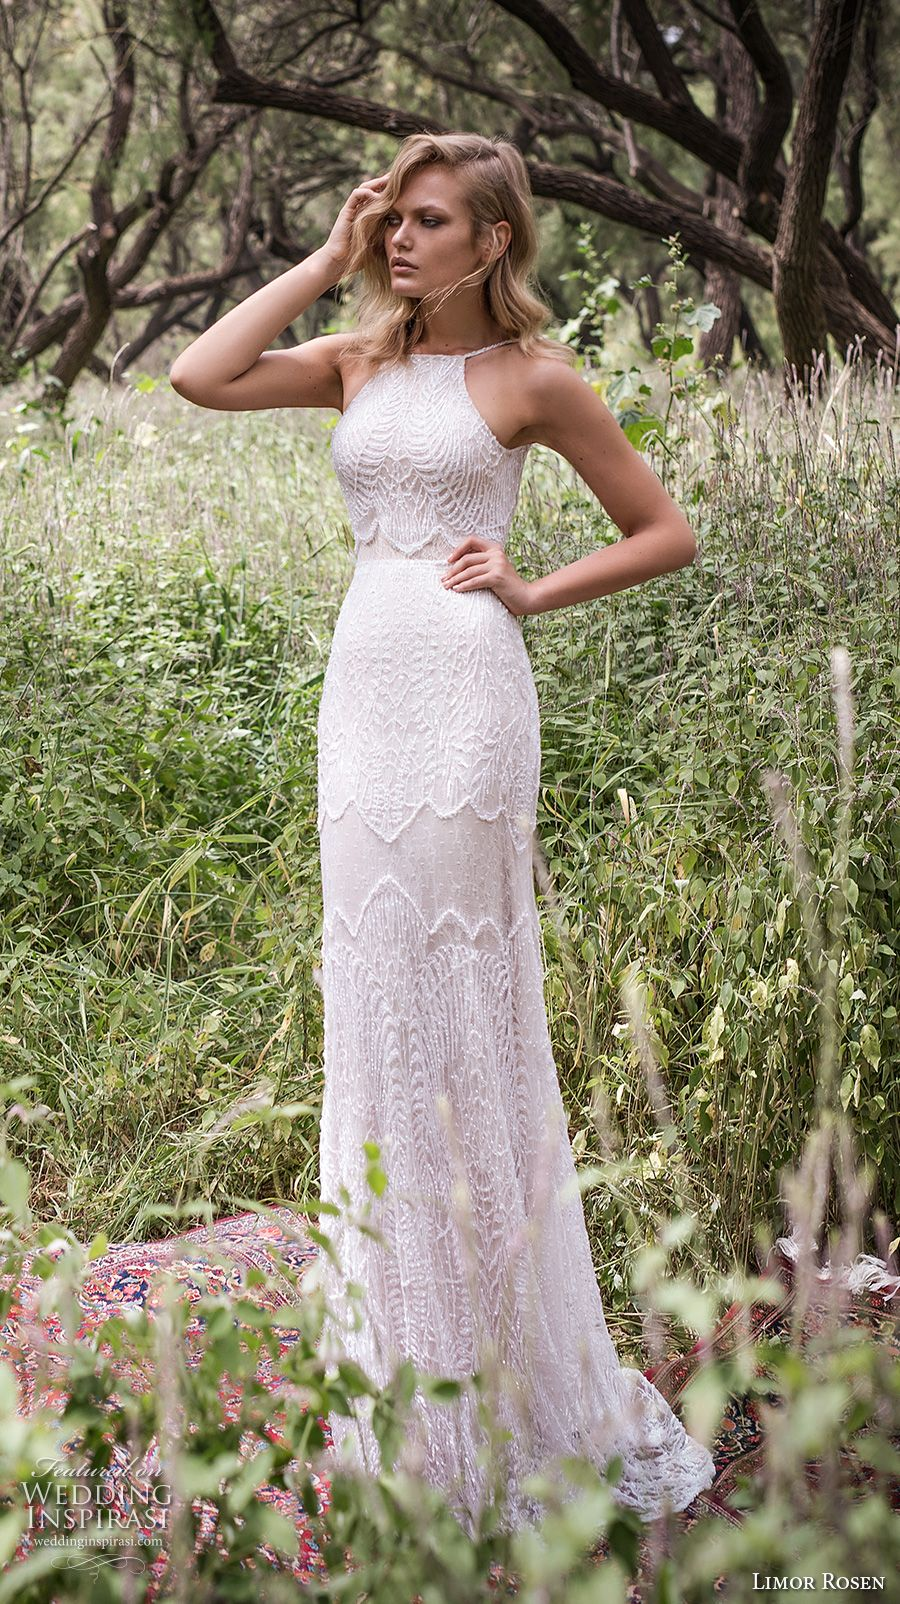 Limor rosen wedding dresses u ucbirds of paradiseud bridal